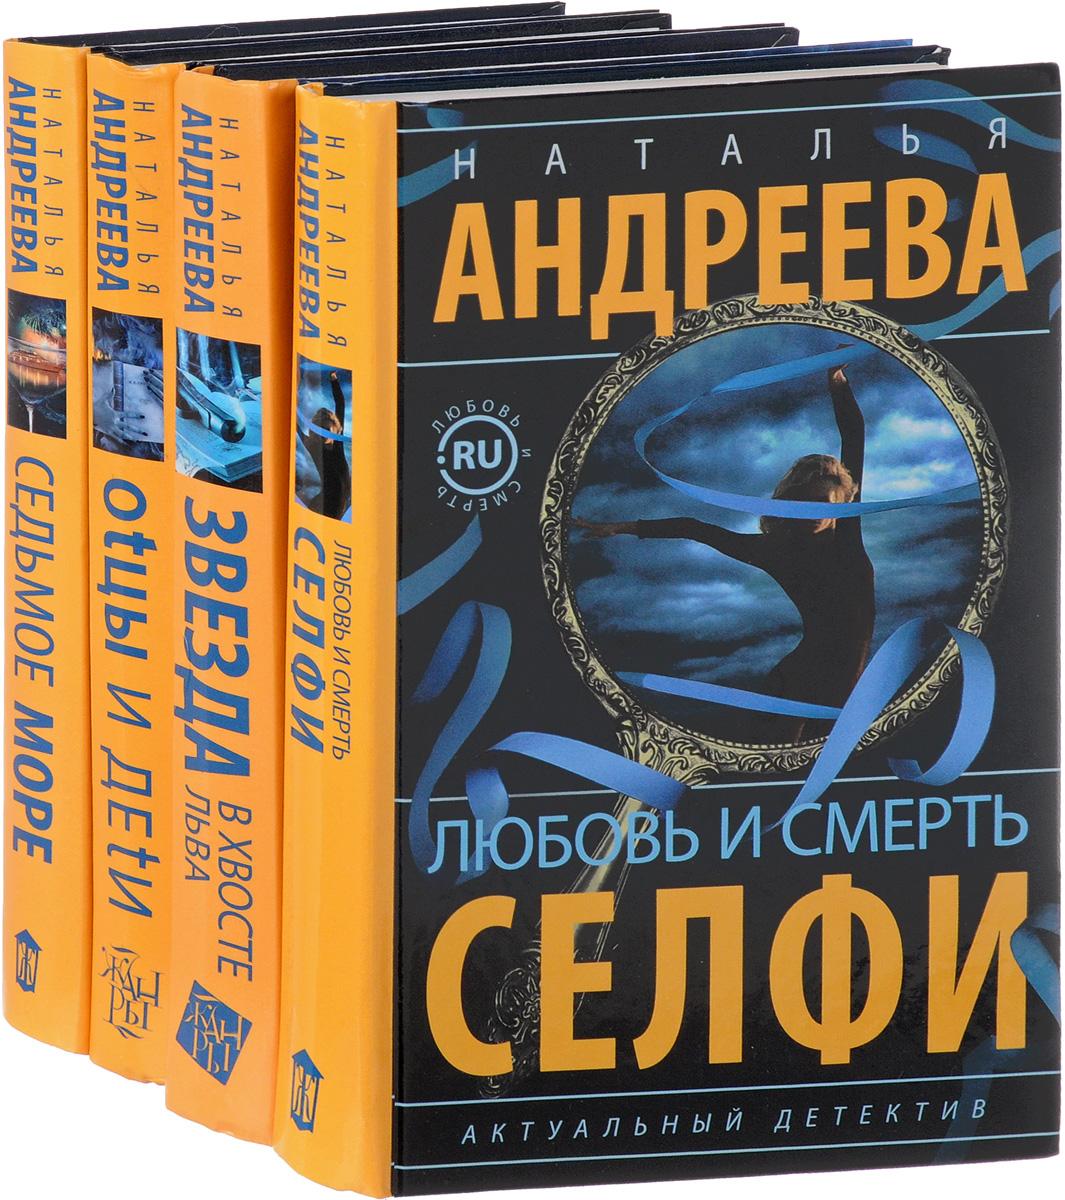 Наталья Андреева Серия